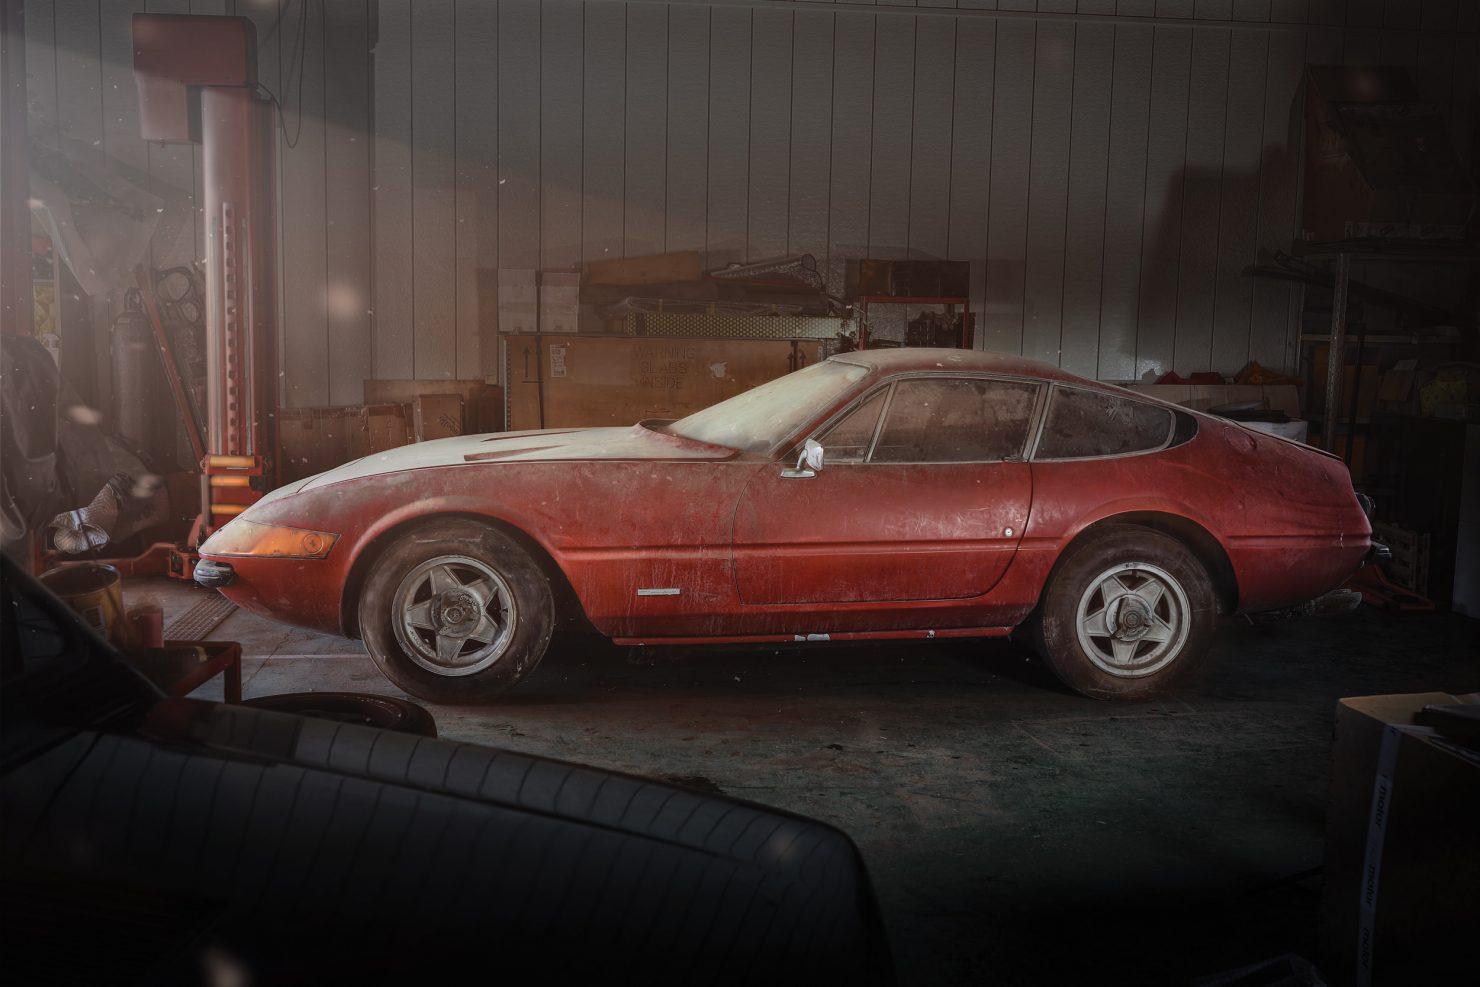 Ferrari 365 GTB4 Daytona Alloy 12 1480x987 - Barn Find: 1969 Ferrari 365 GTB/4 Daytona Alloy